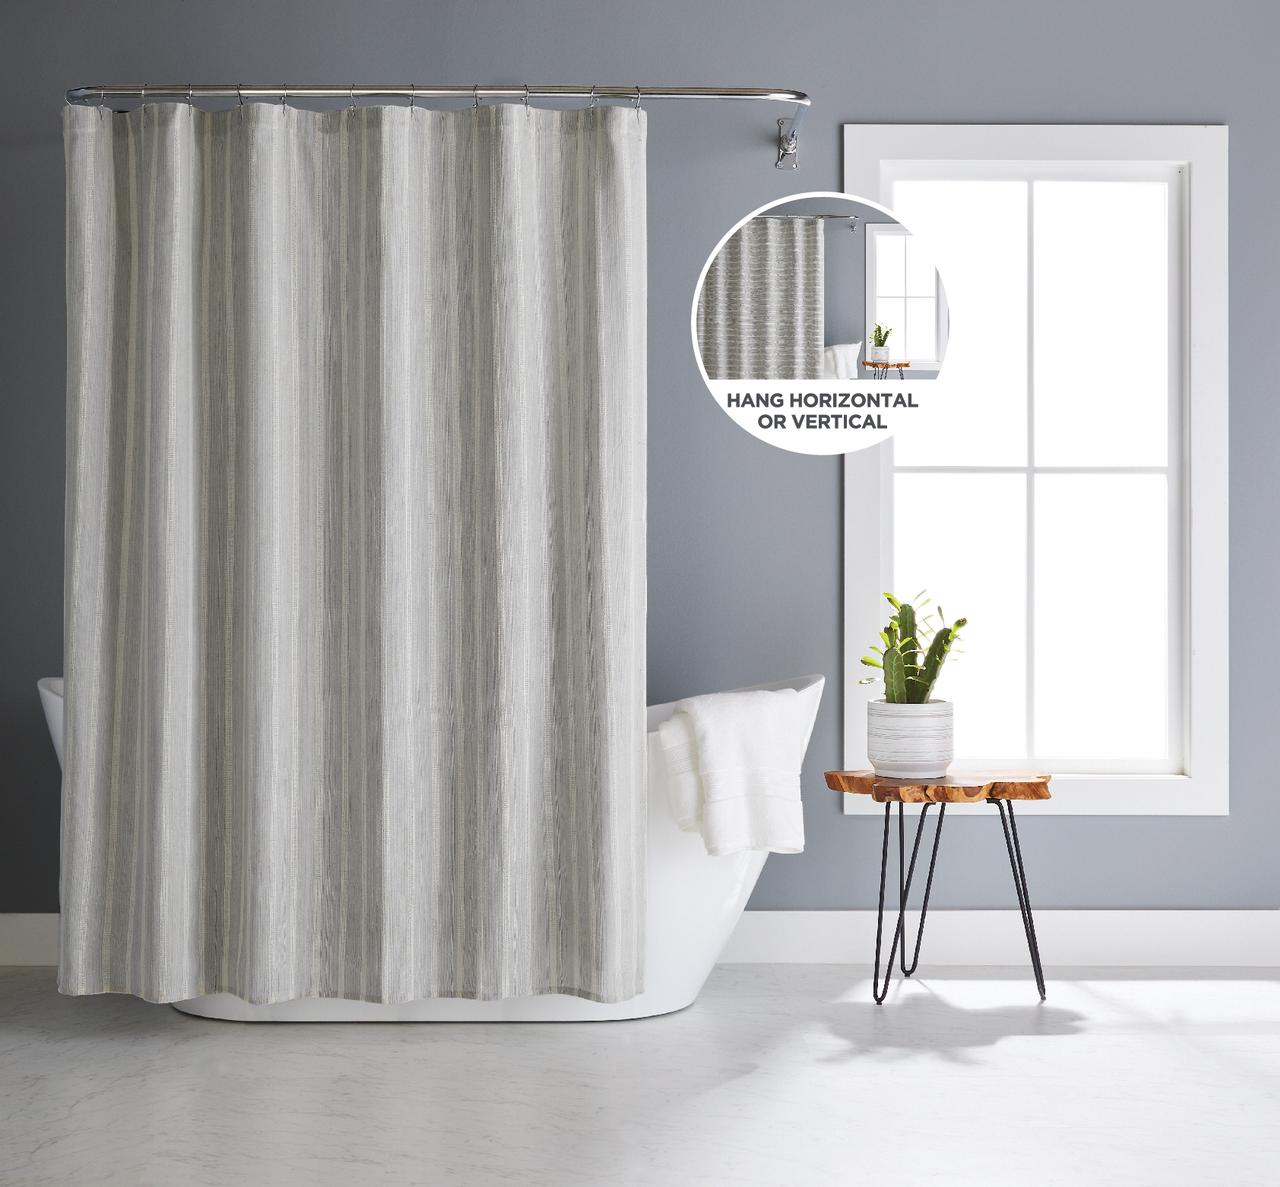 better homes gardens basketweave stripe poly cotton fabric shower curtain 72 x 72 grey walmart com